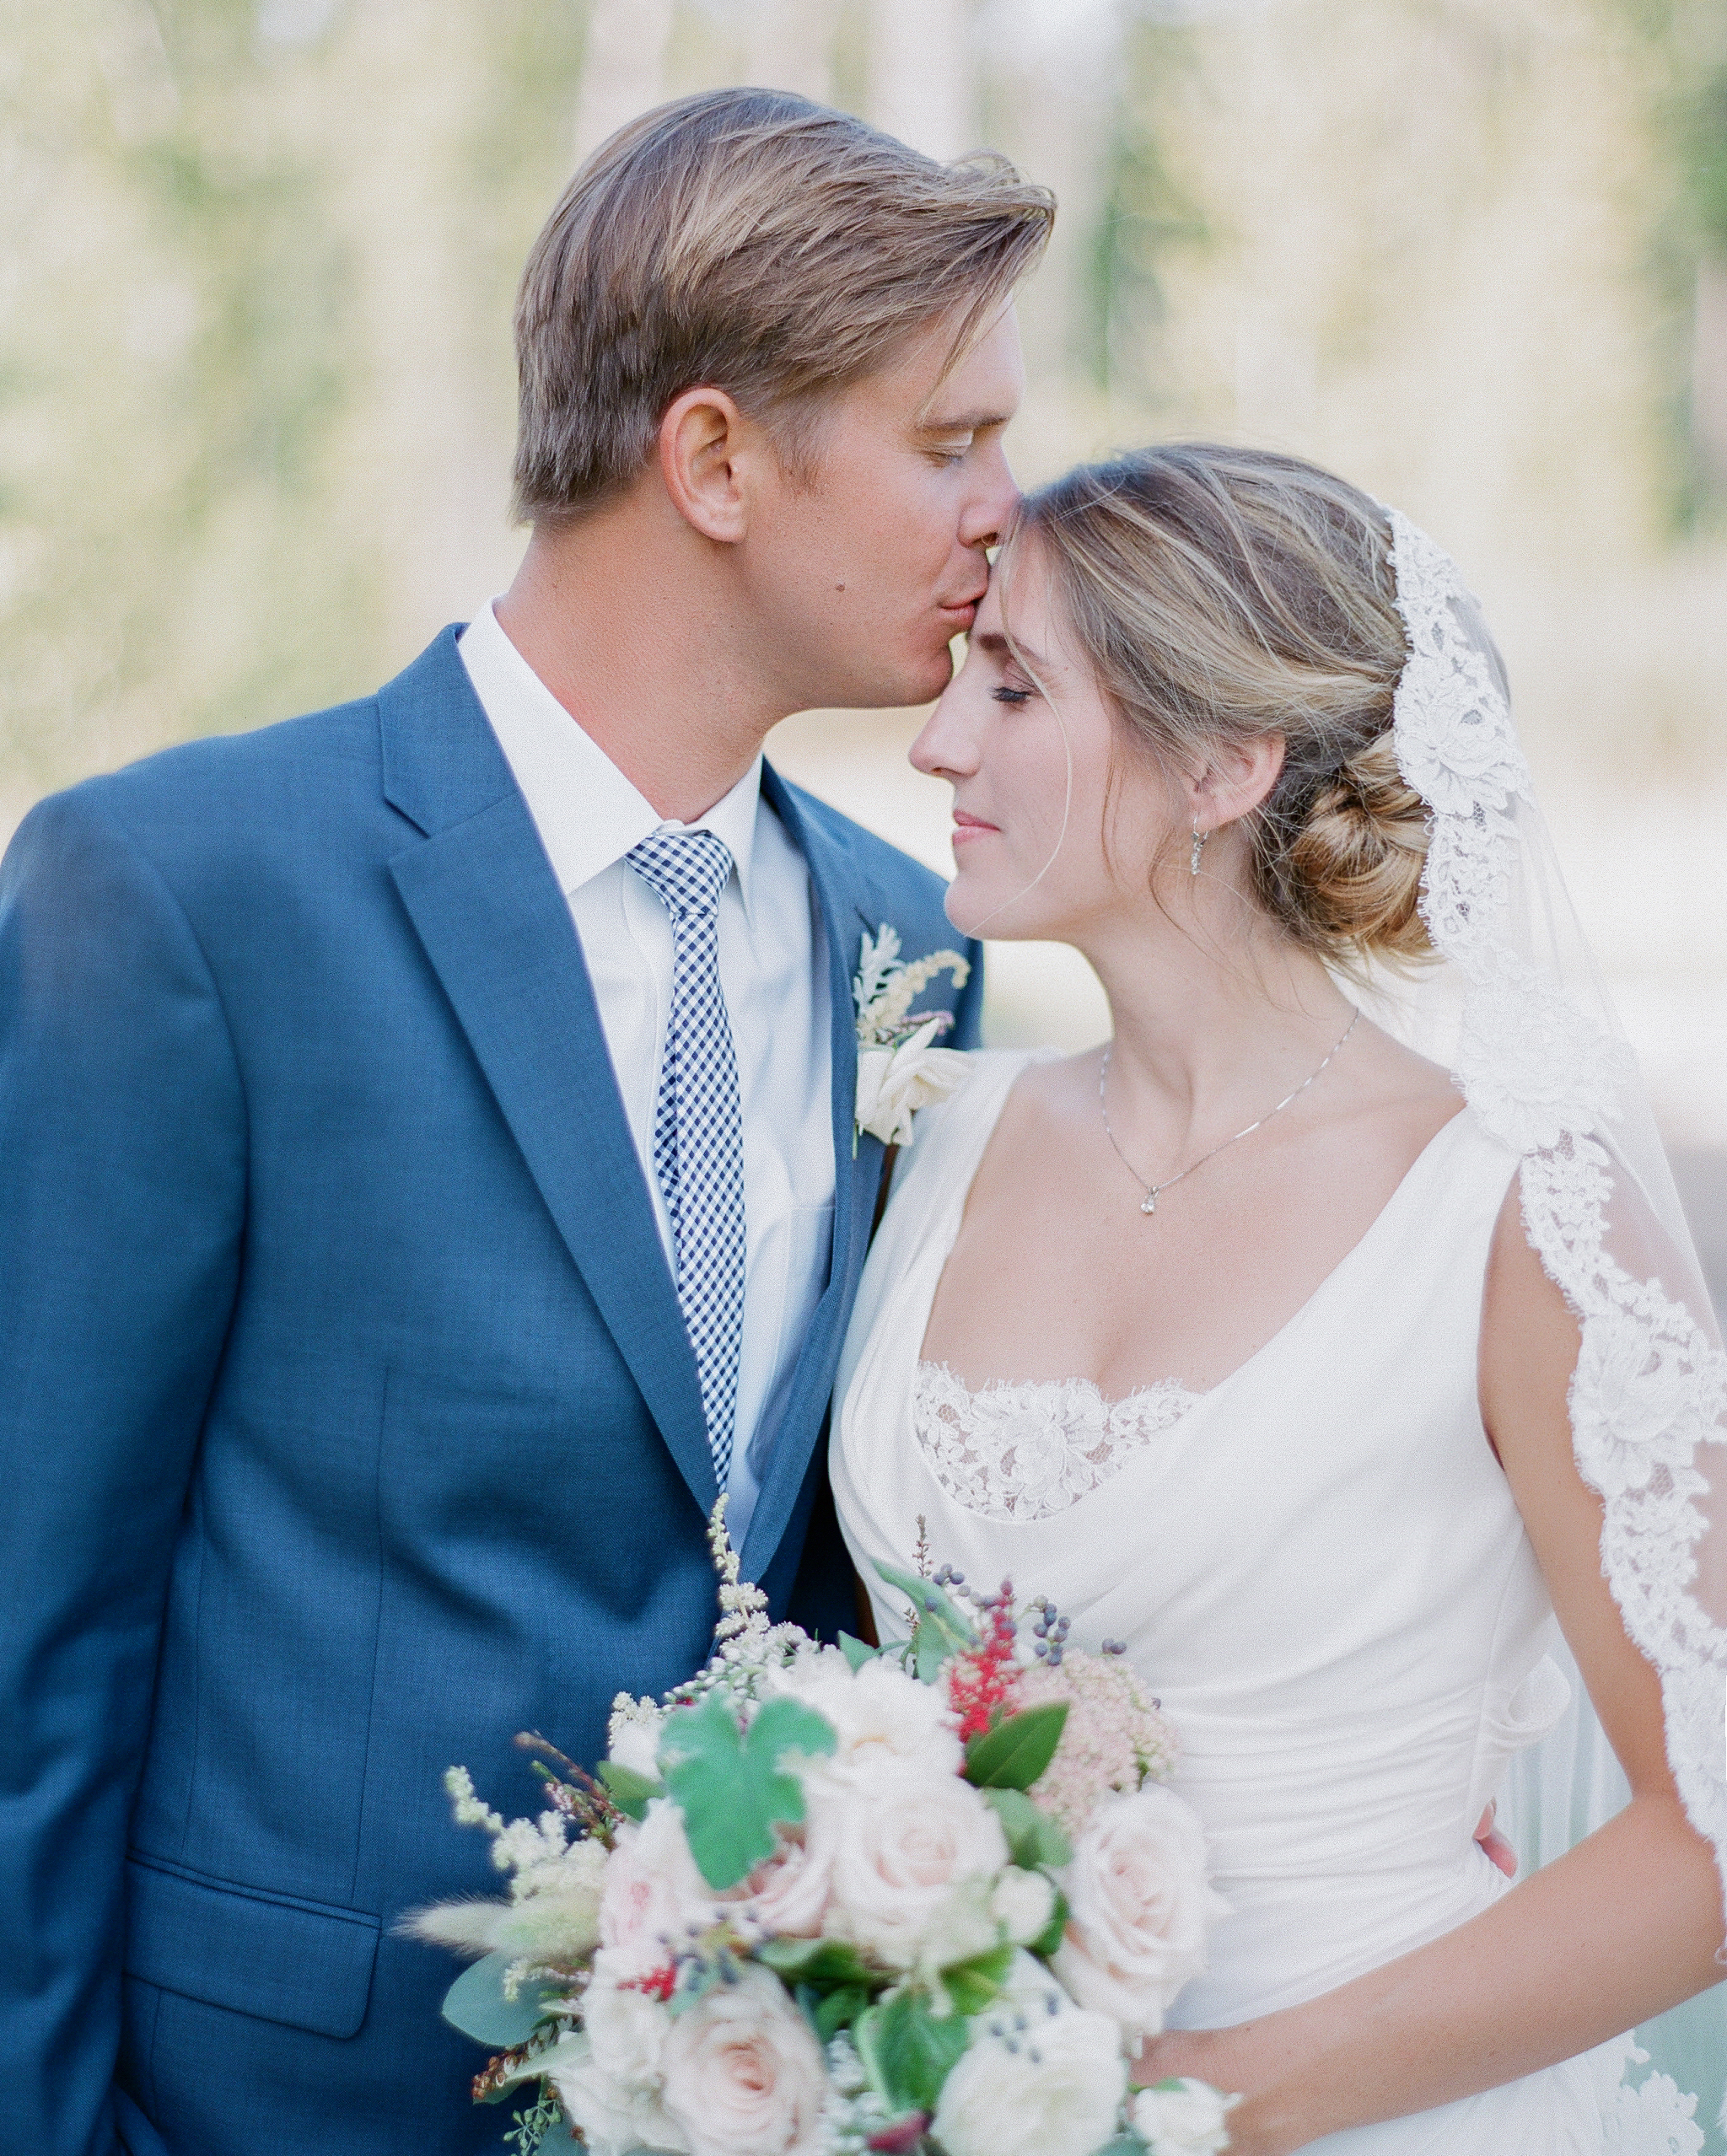 robin-kenny-wedding-couple-067-s112068-0715.jpg